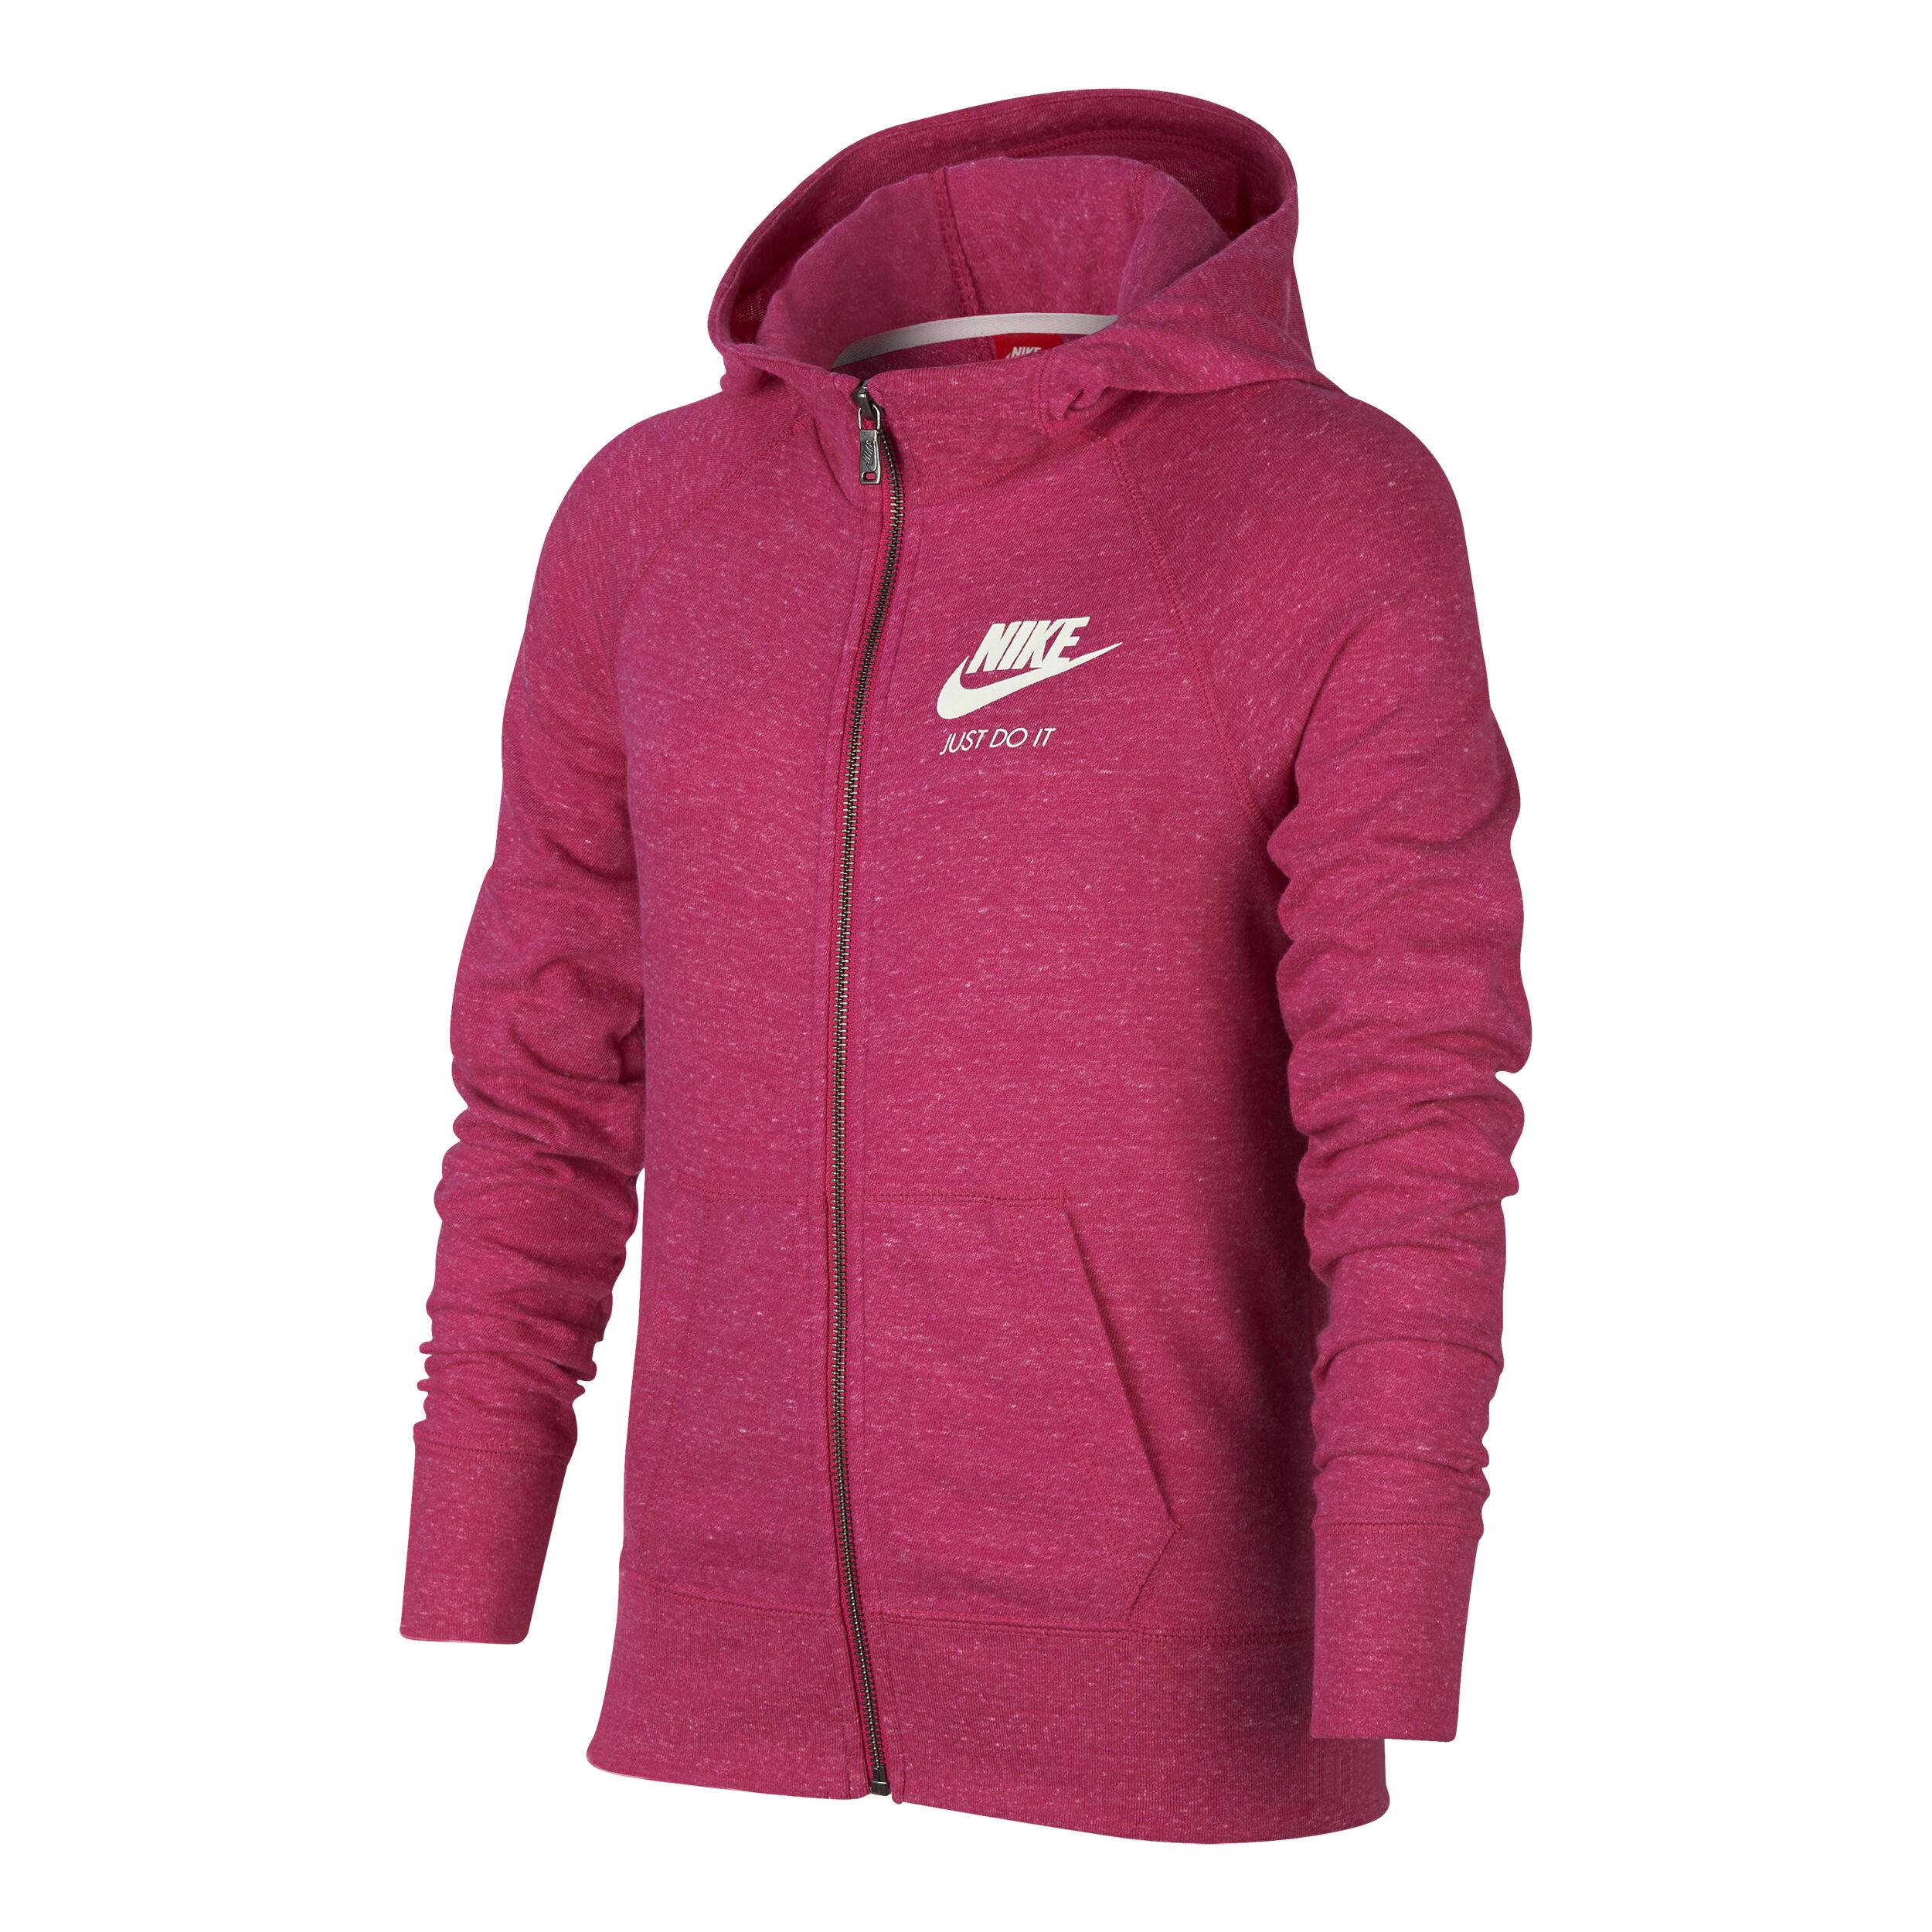 Nike Sportswear Gym Vintage Full Zip Sweatjacke Mädchen Pink, Grau